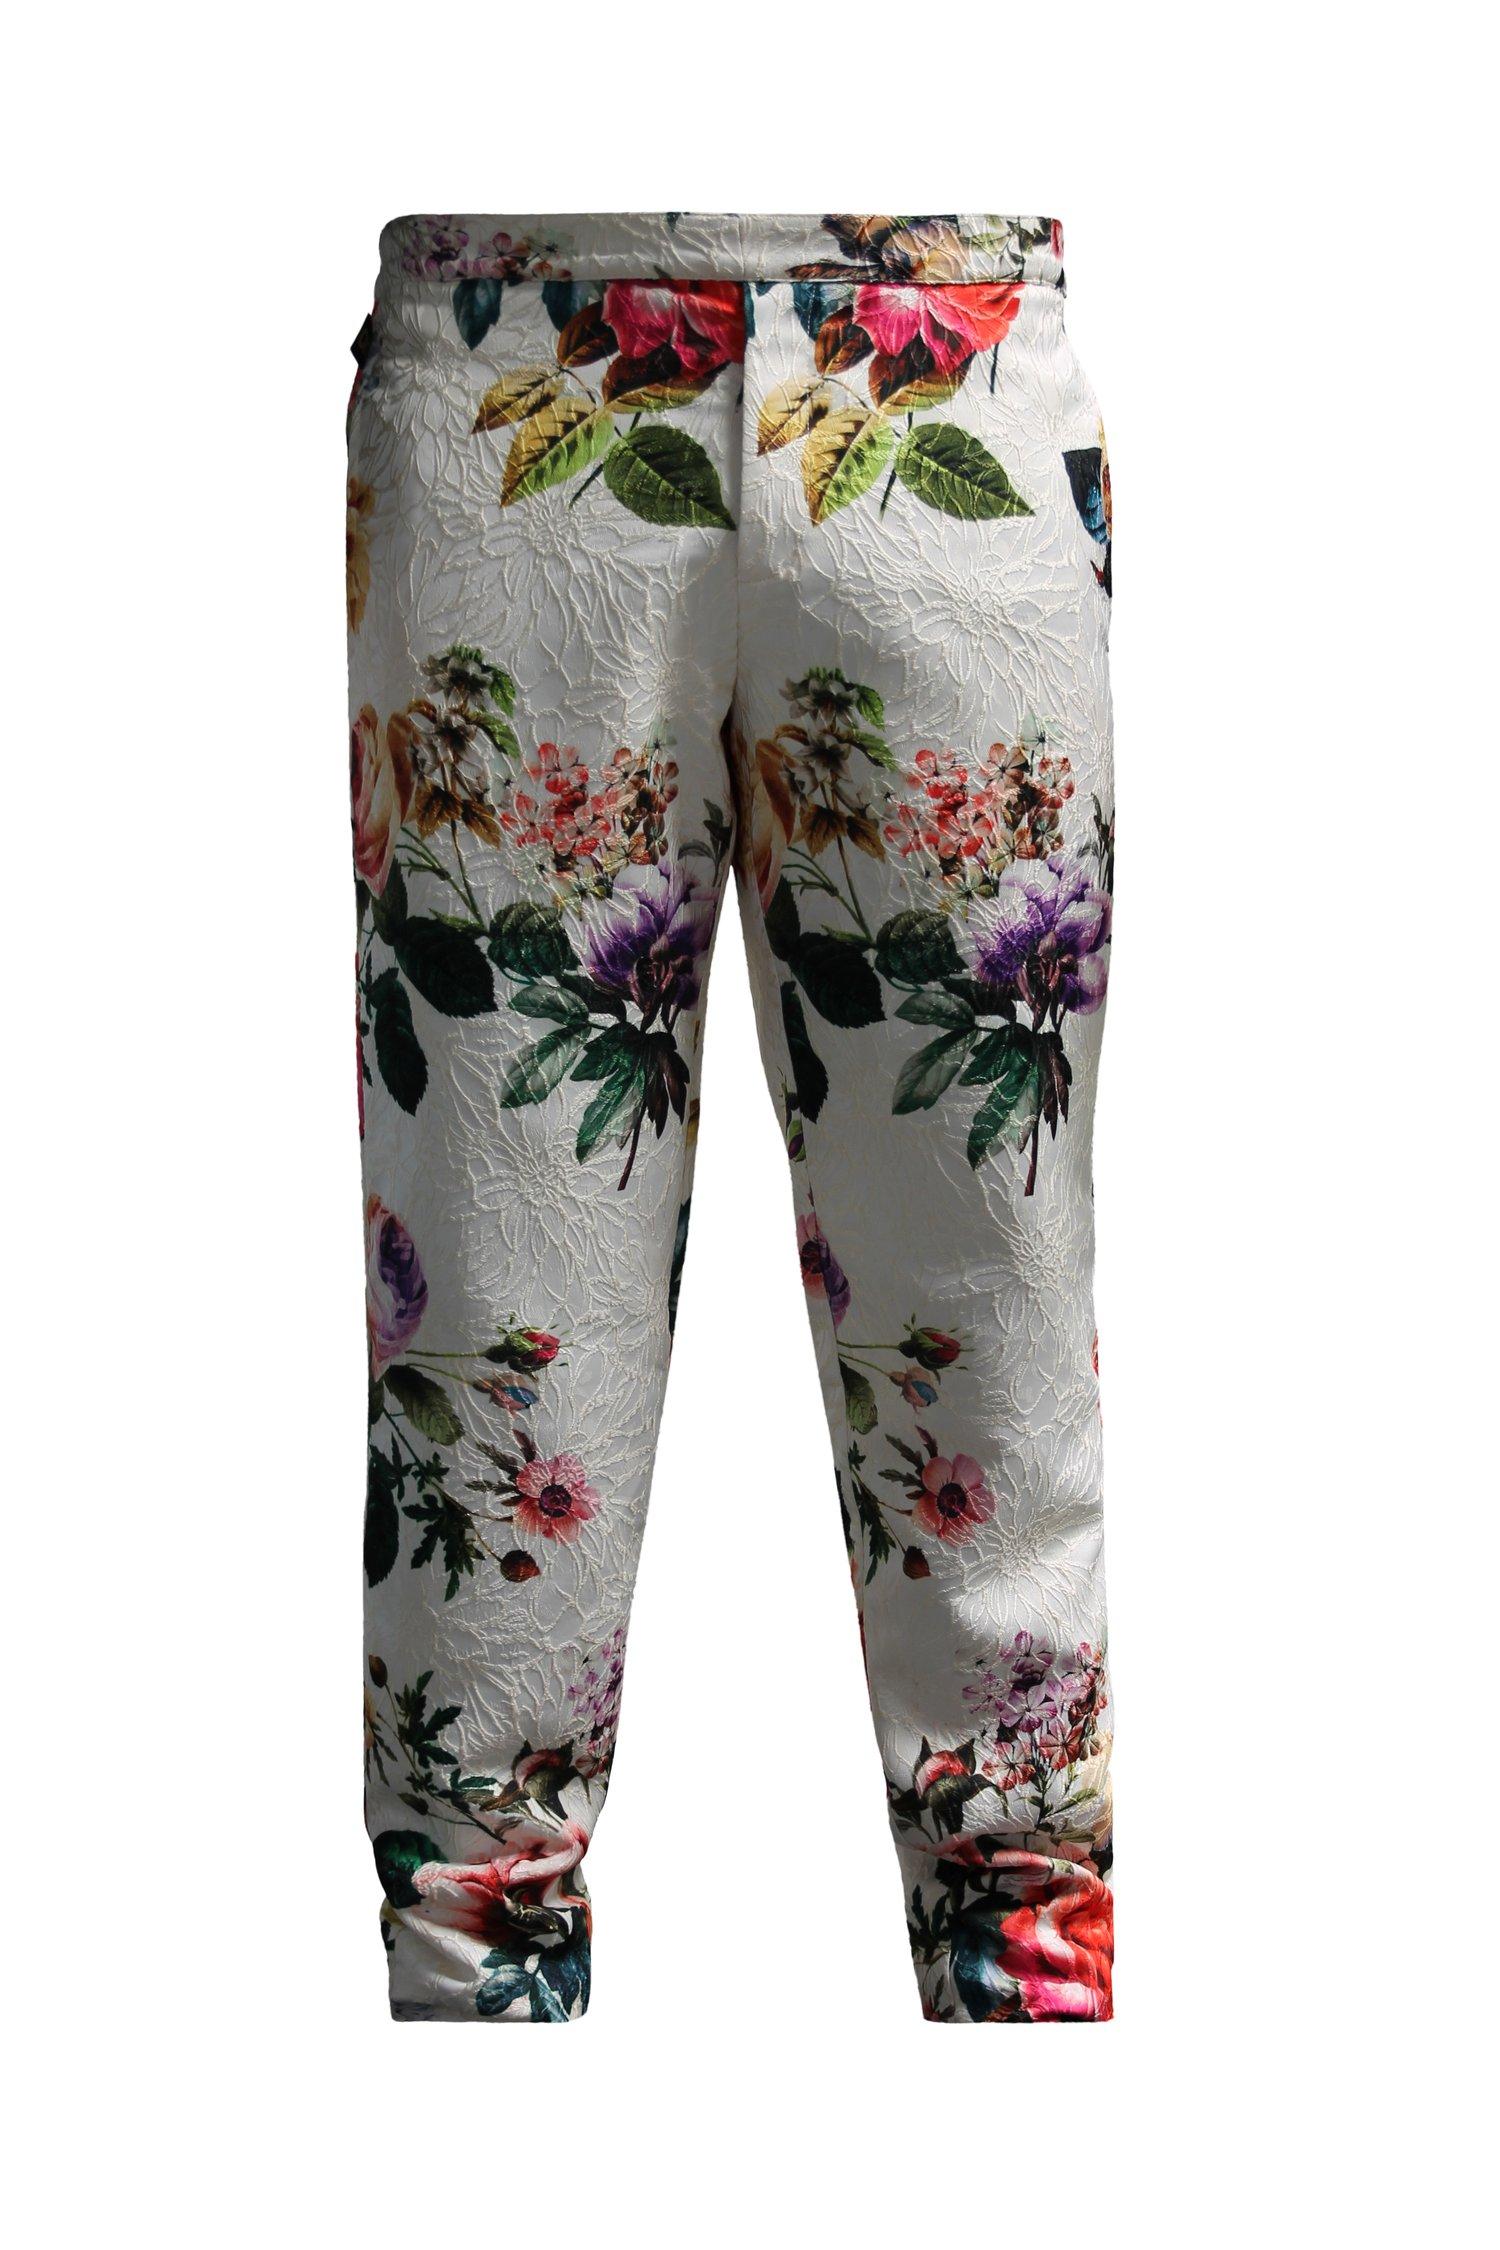 Image of Printed Brocade Pant